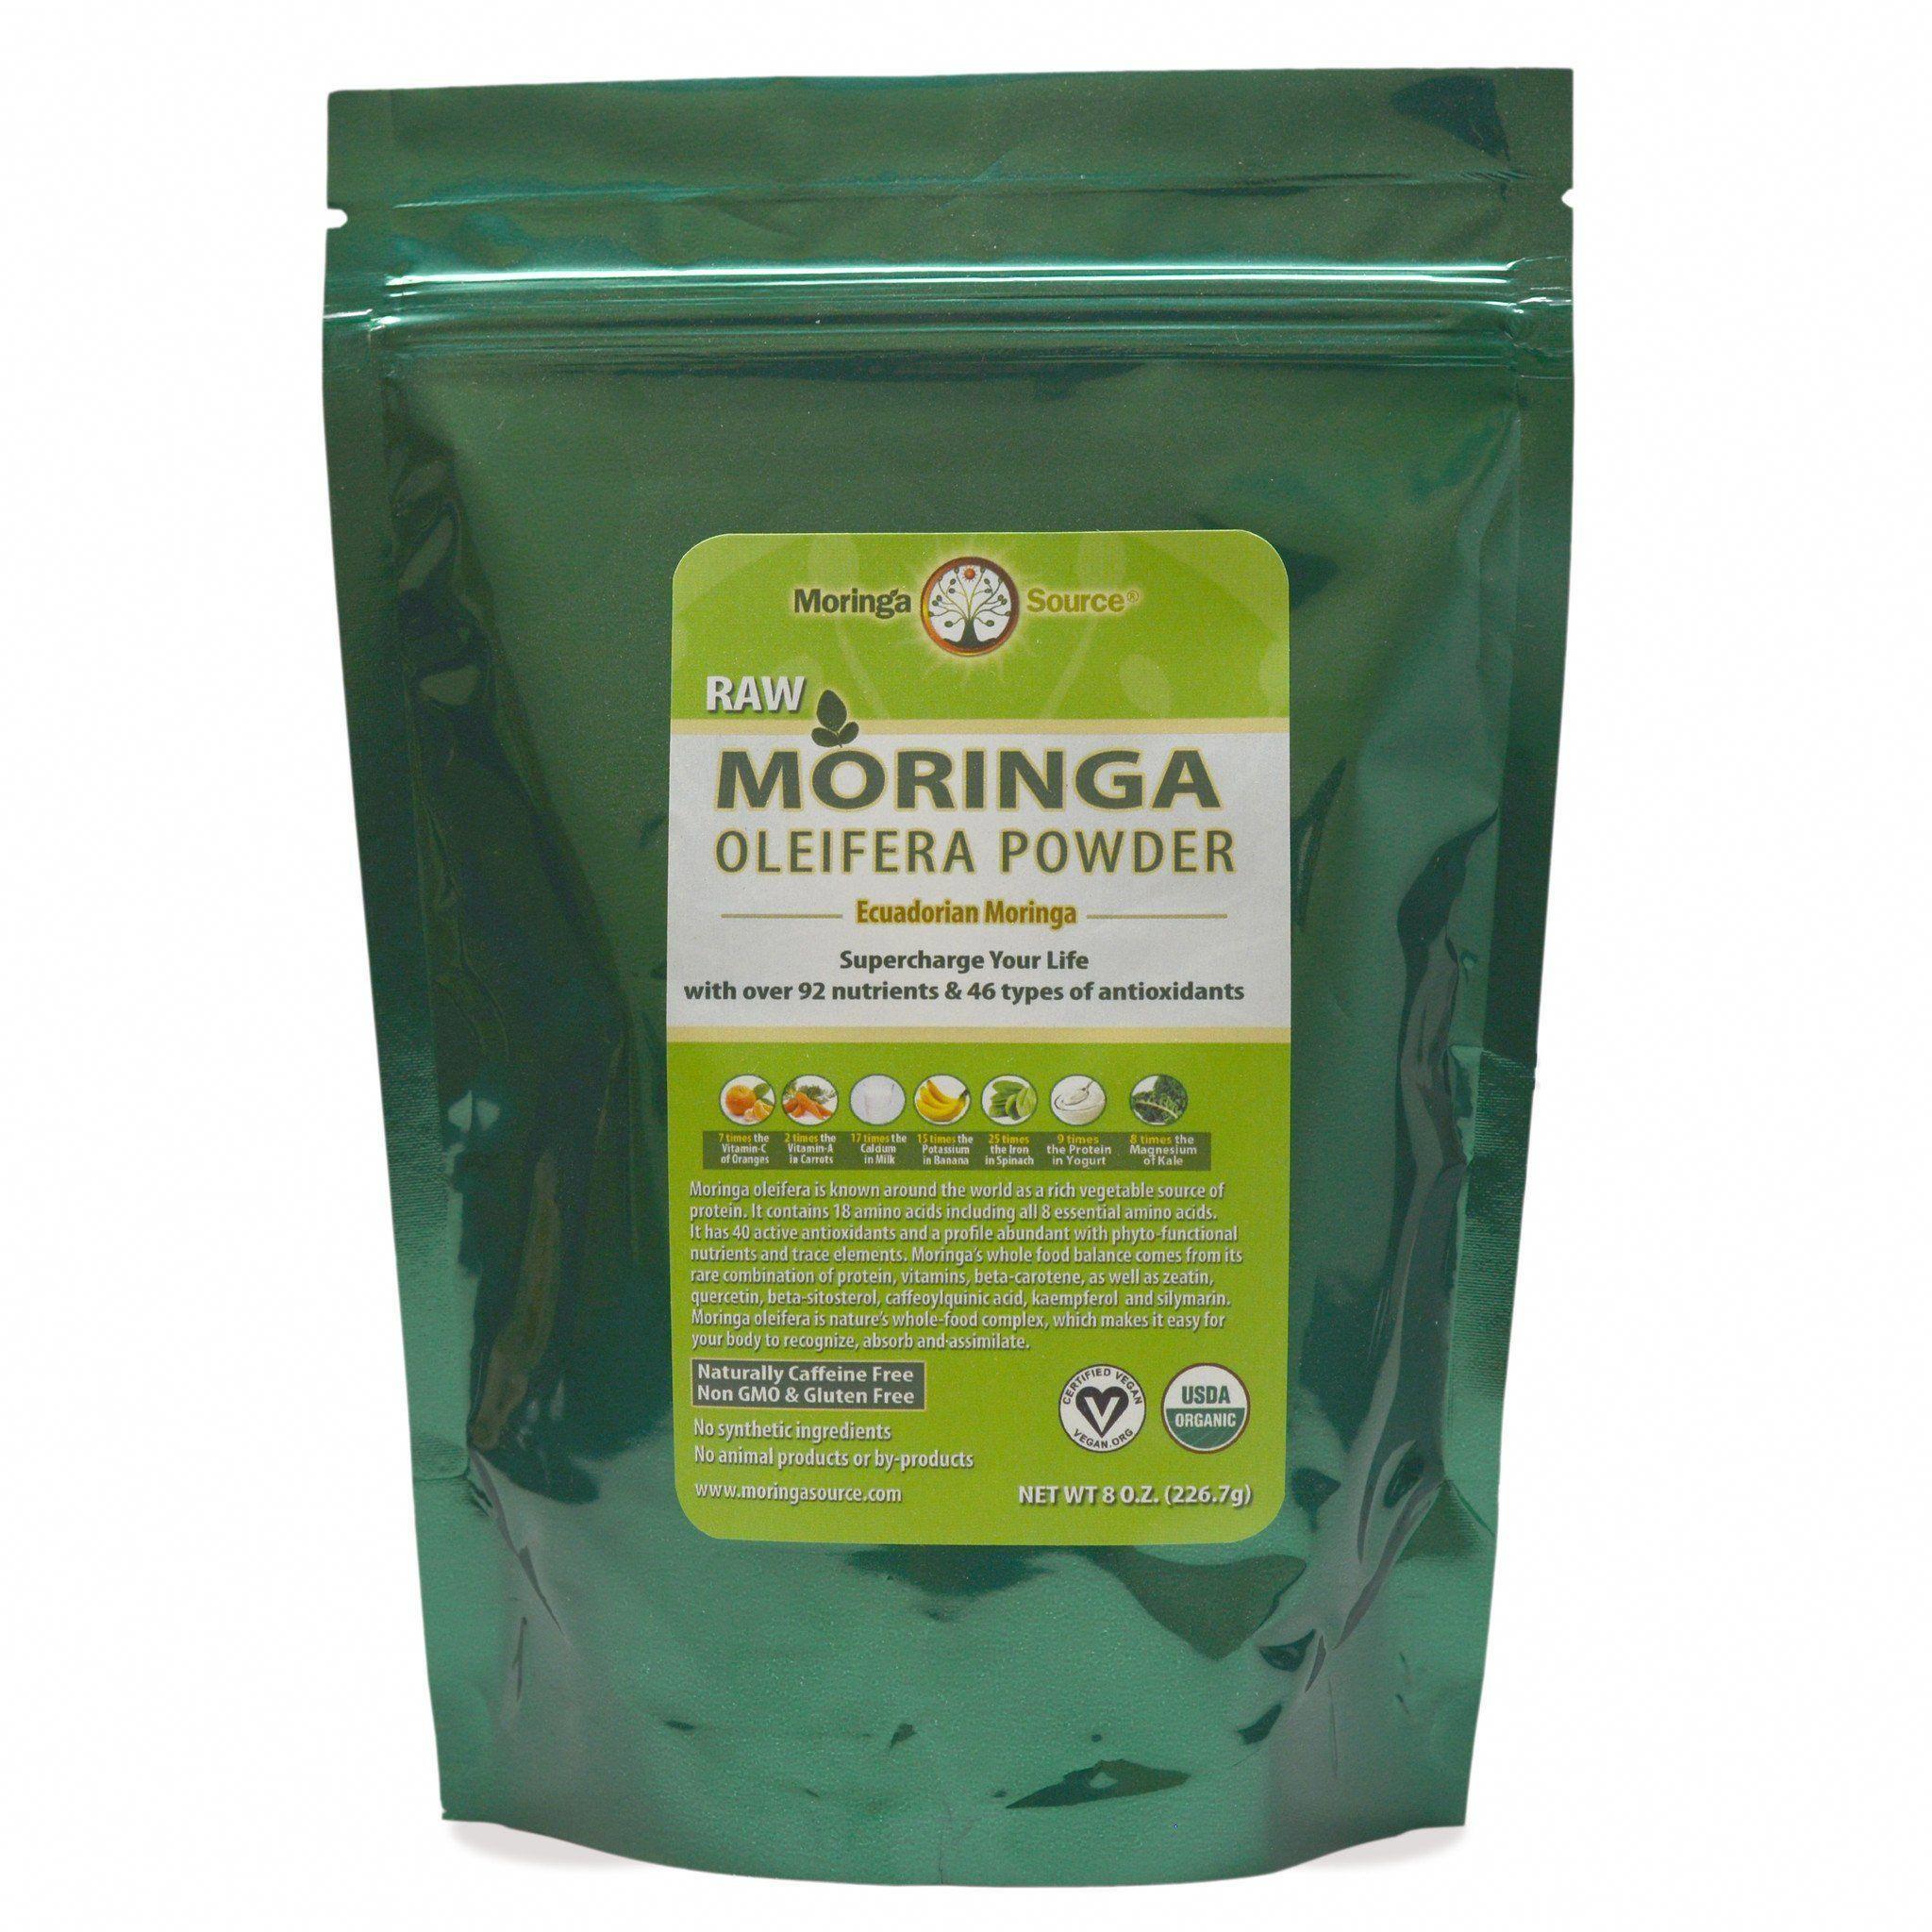 Nutritional Supplements Moringa Powder Moringa Source